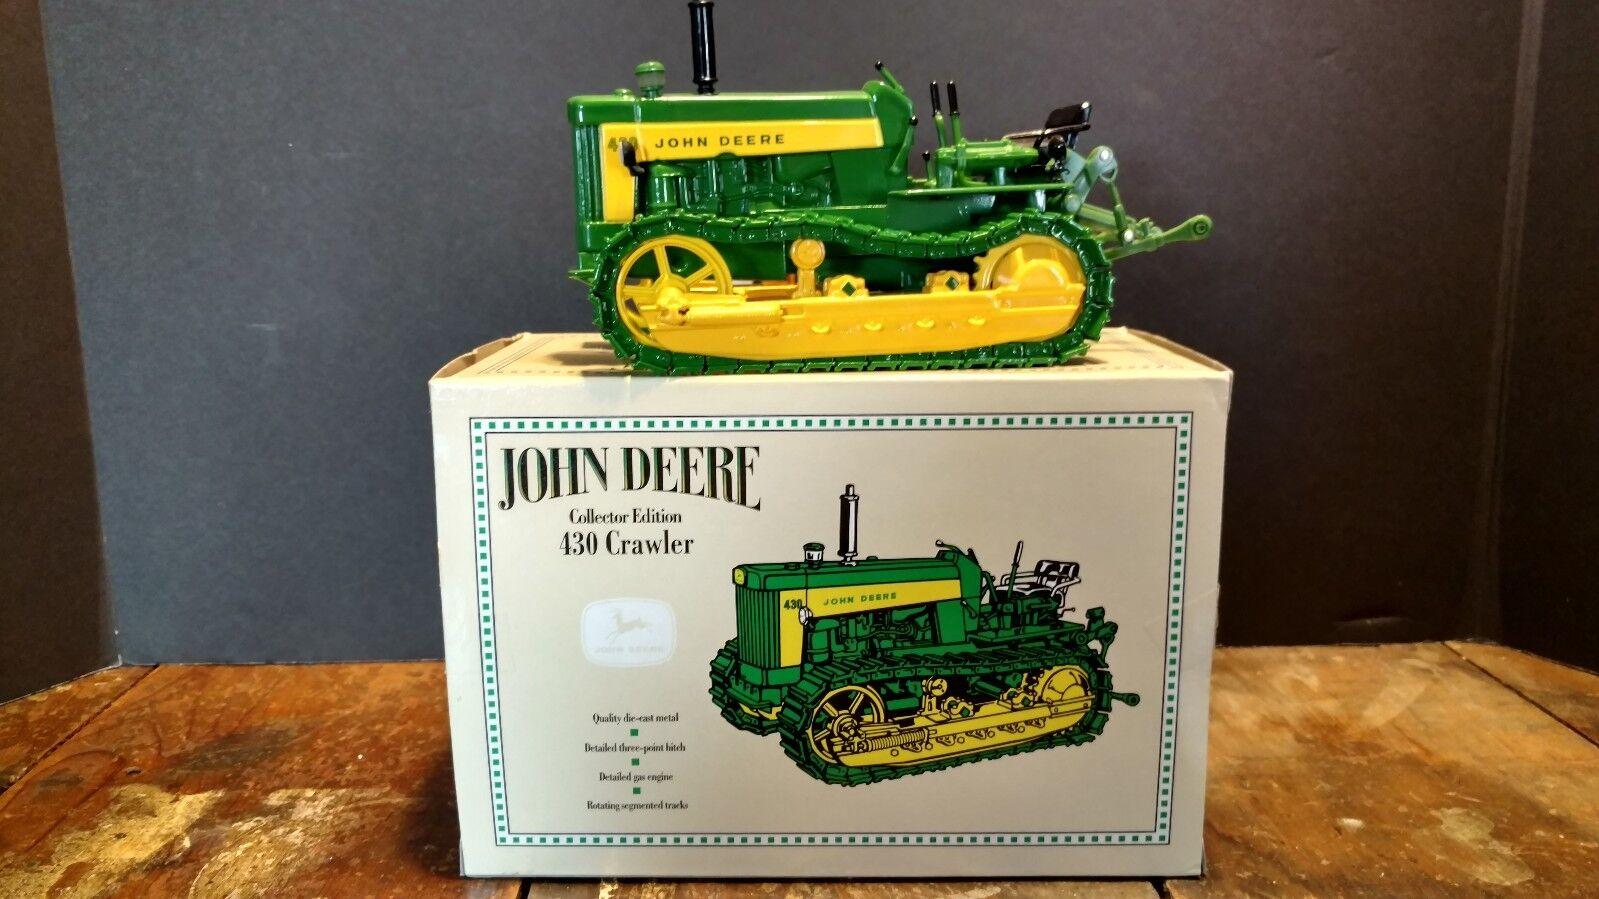 ERTL John Deere 430 Crawler échelle 1 16 Diecast Toy Collector Edition